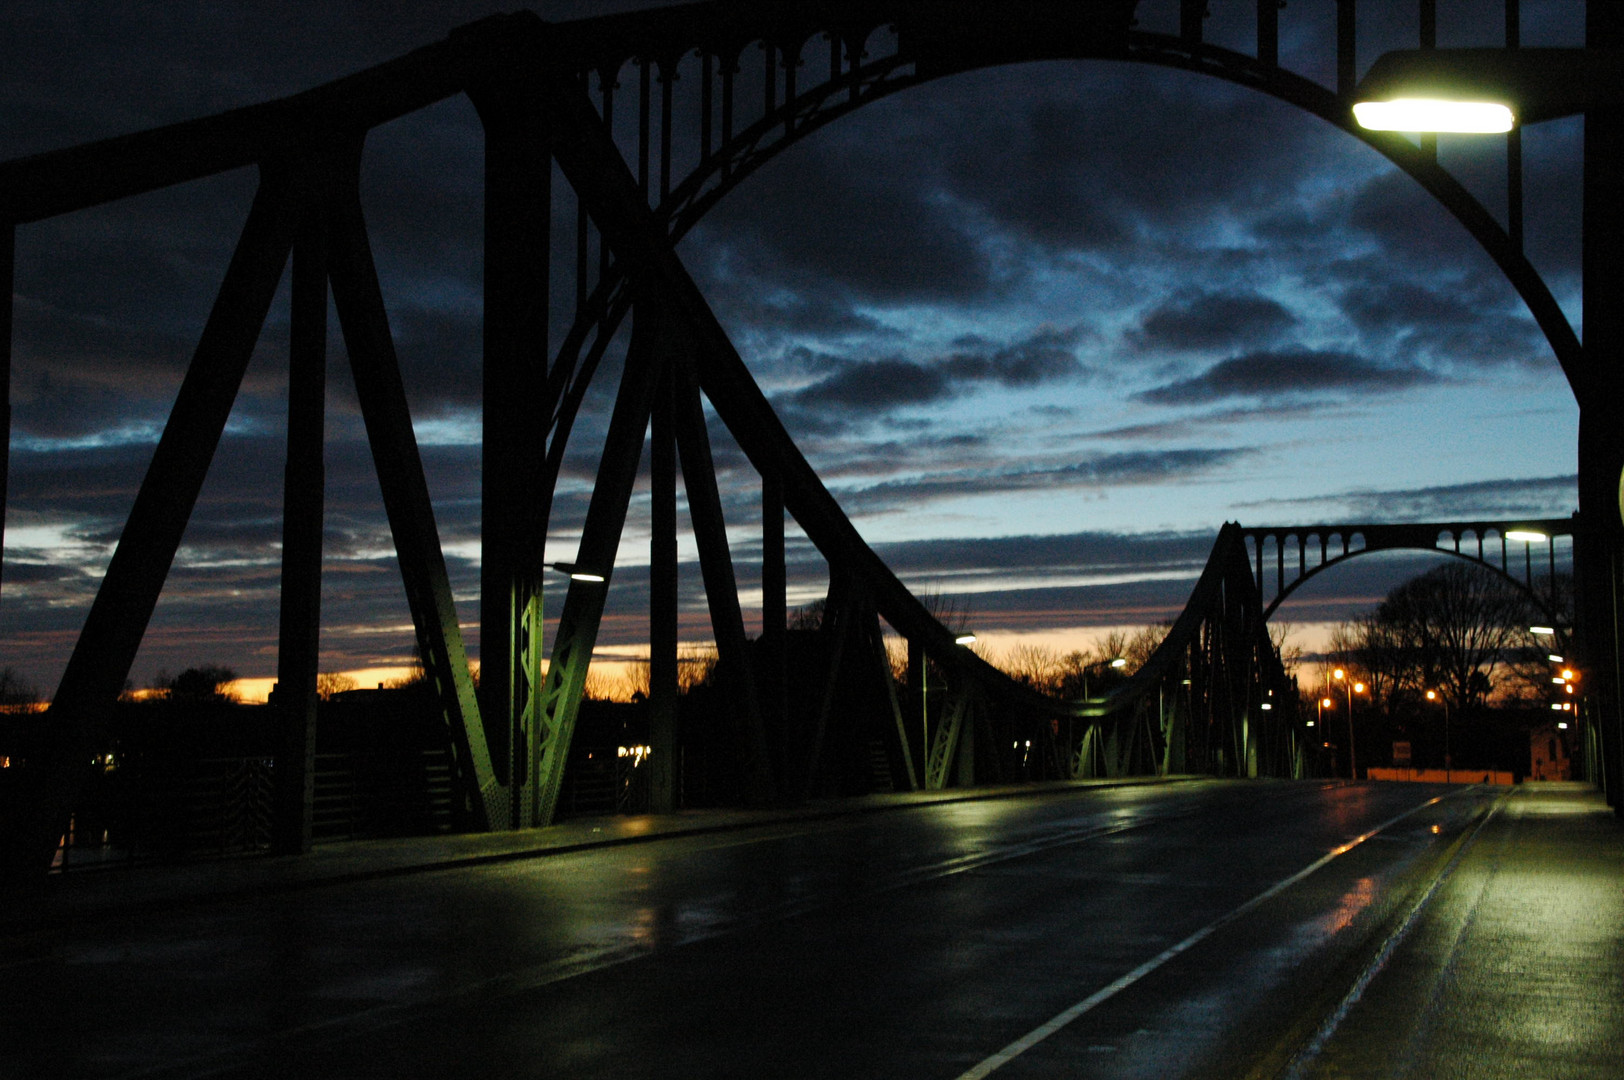 Glienicker Brücke (26.12.2016)